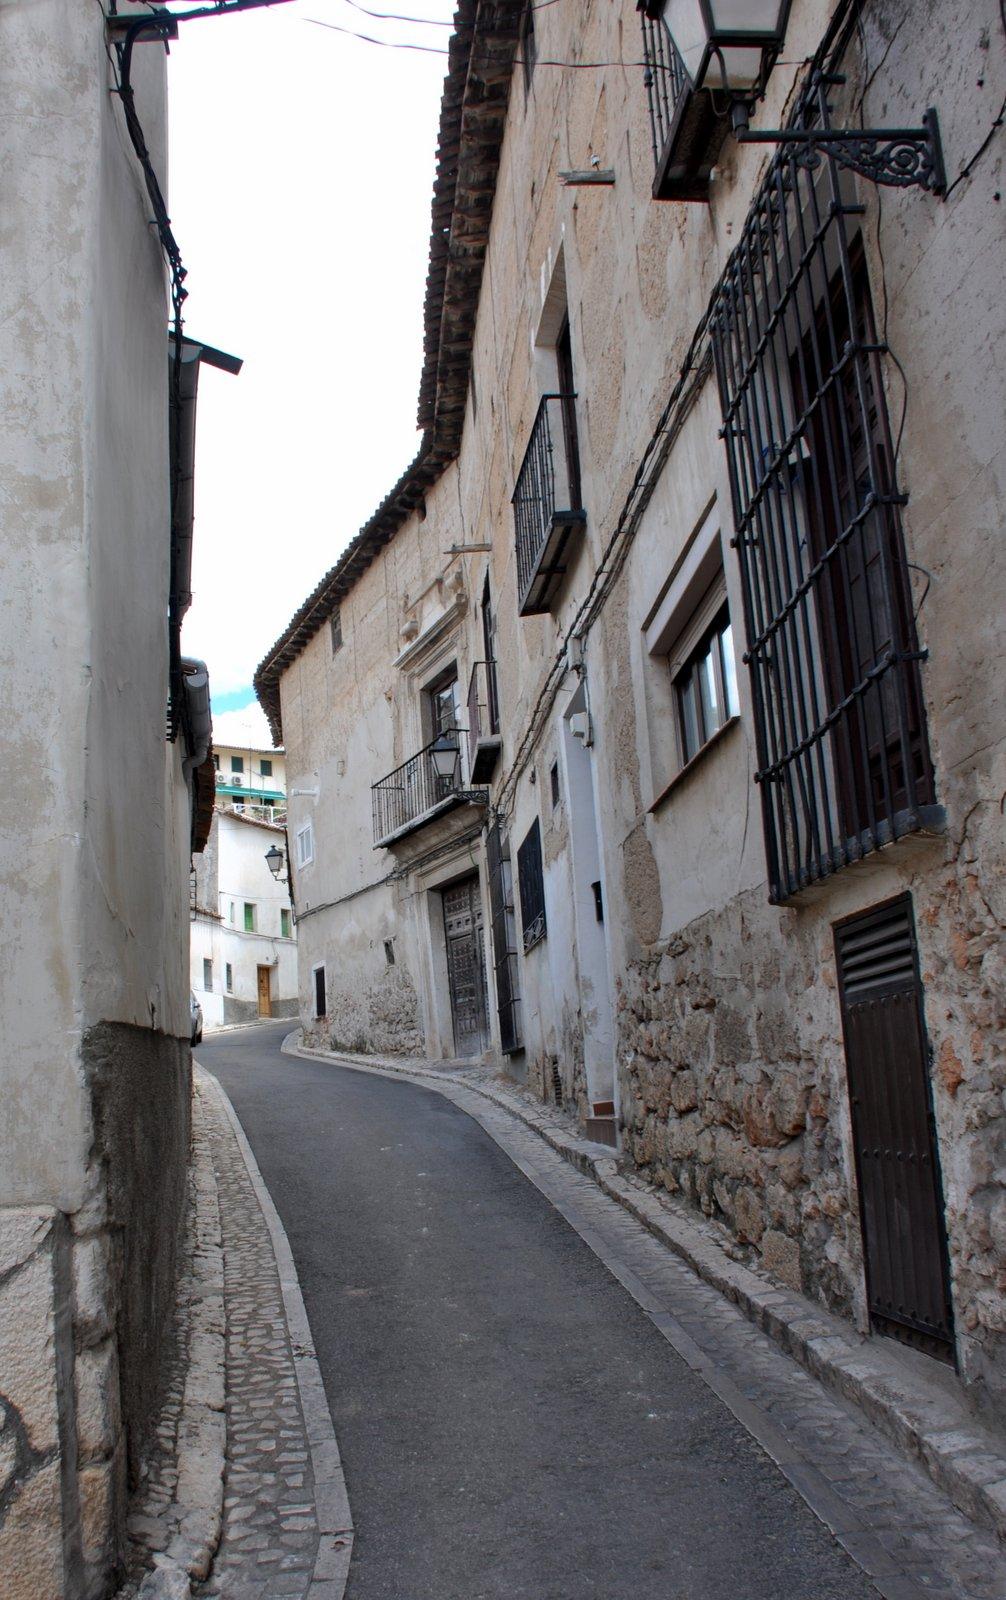 Calle de Chinchon